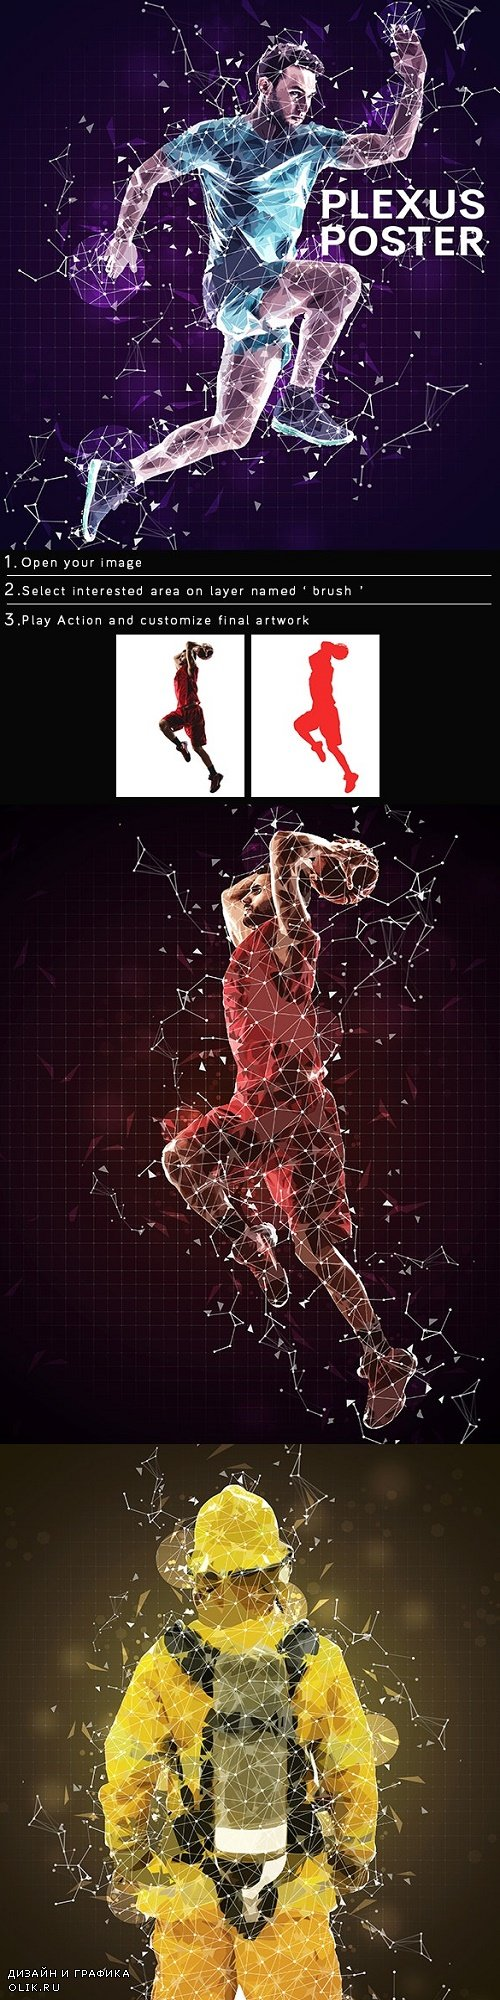 Plexus Poster Photoshop Action 24098473